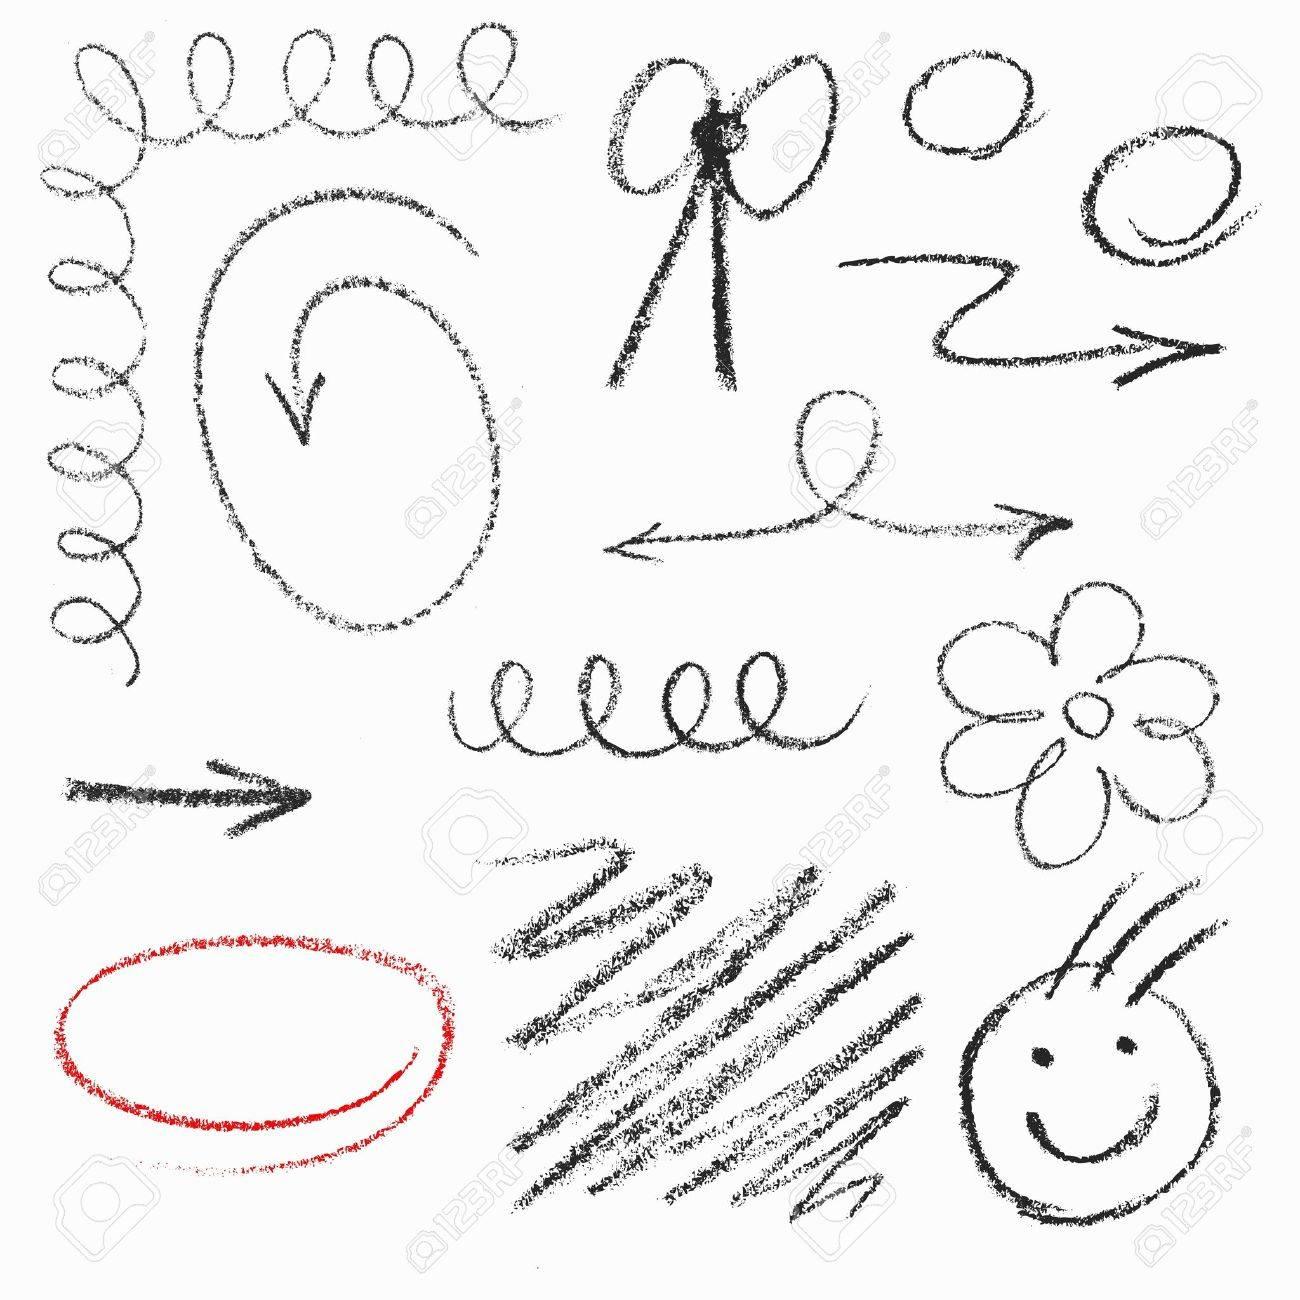 Set of hand drawn pastel elements. - 21998576